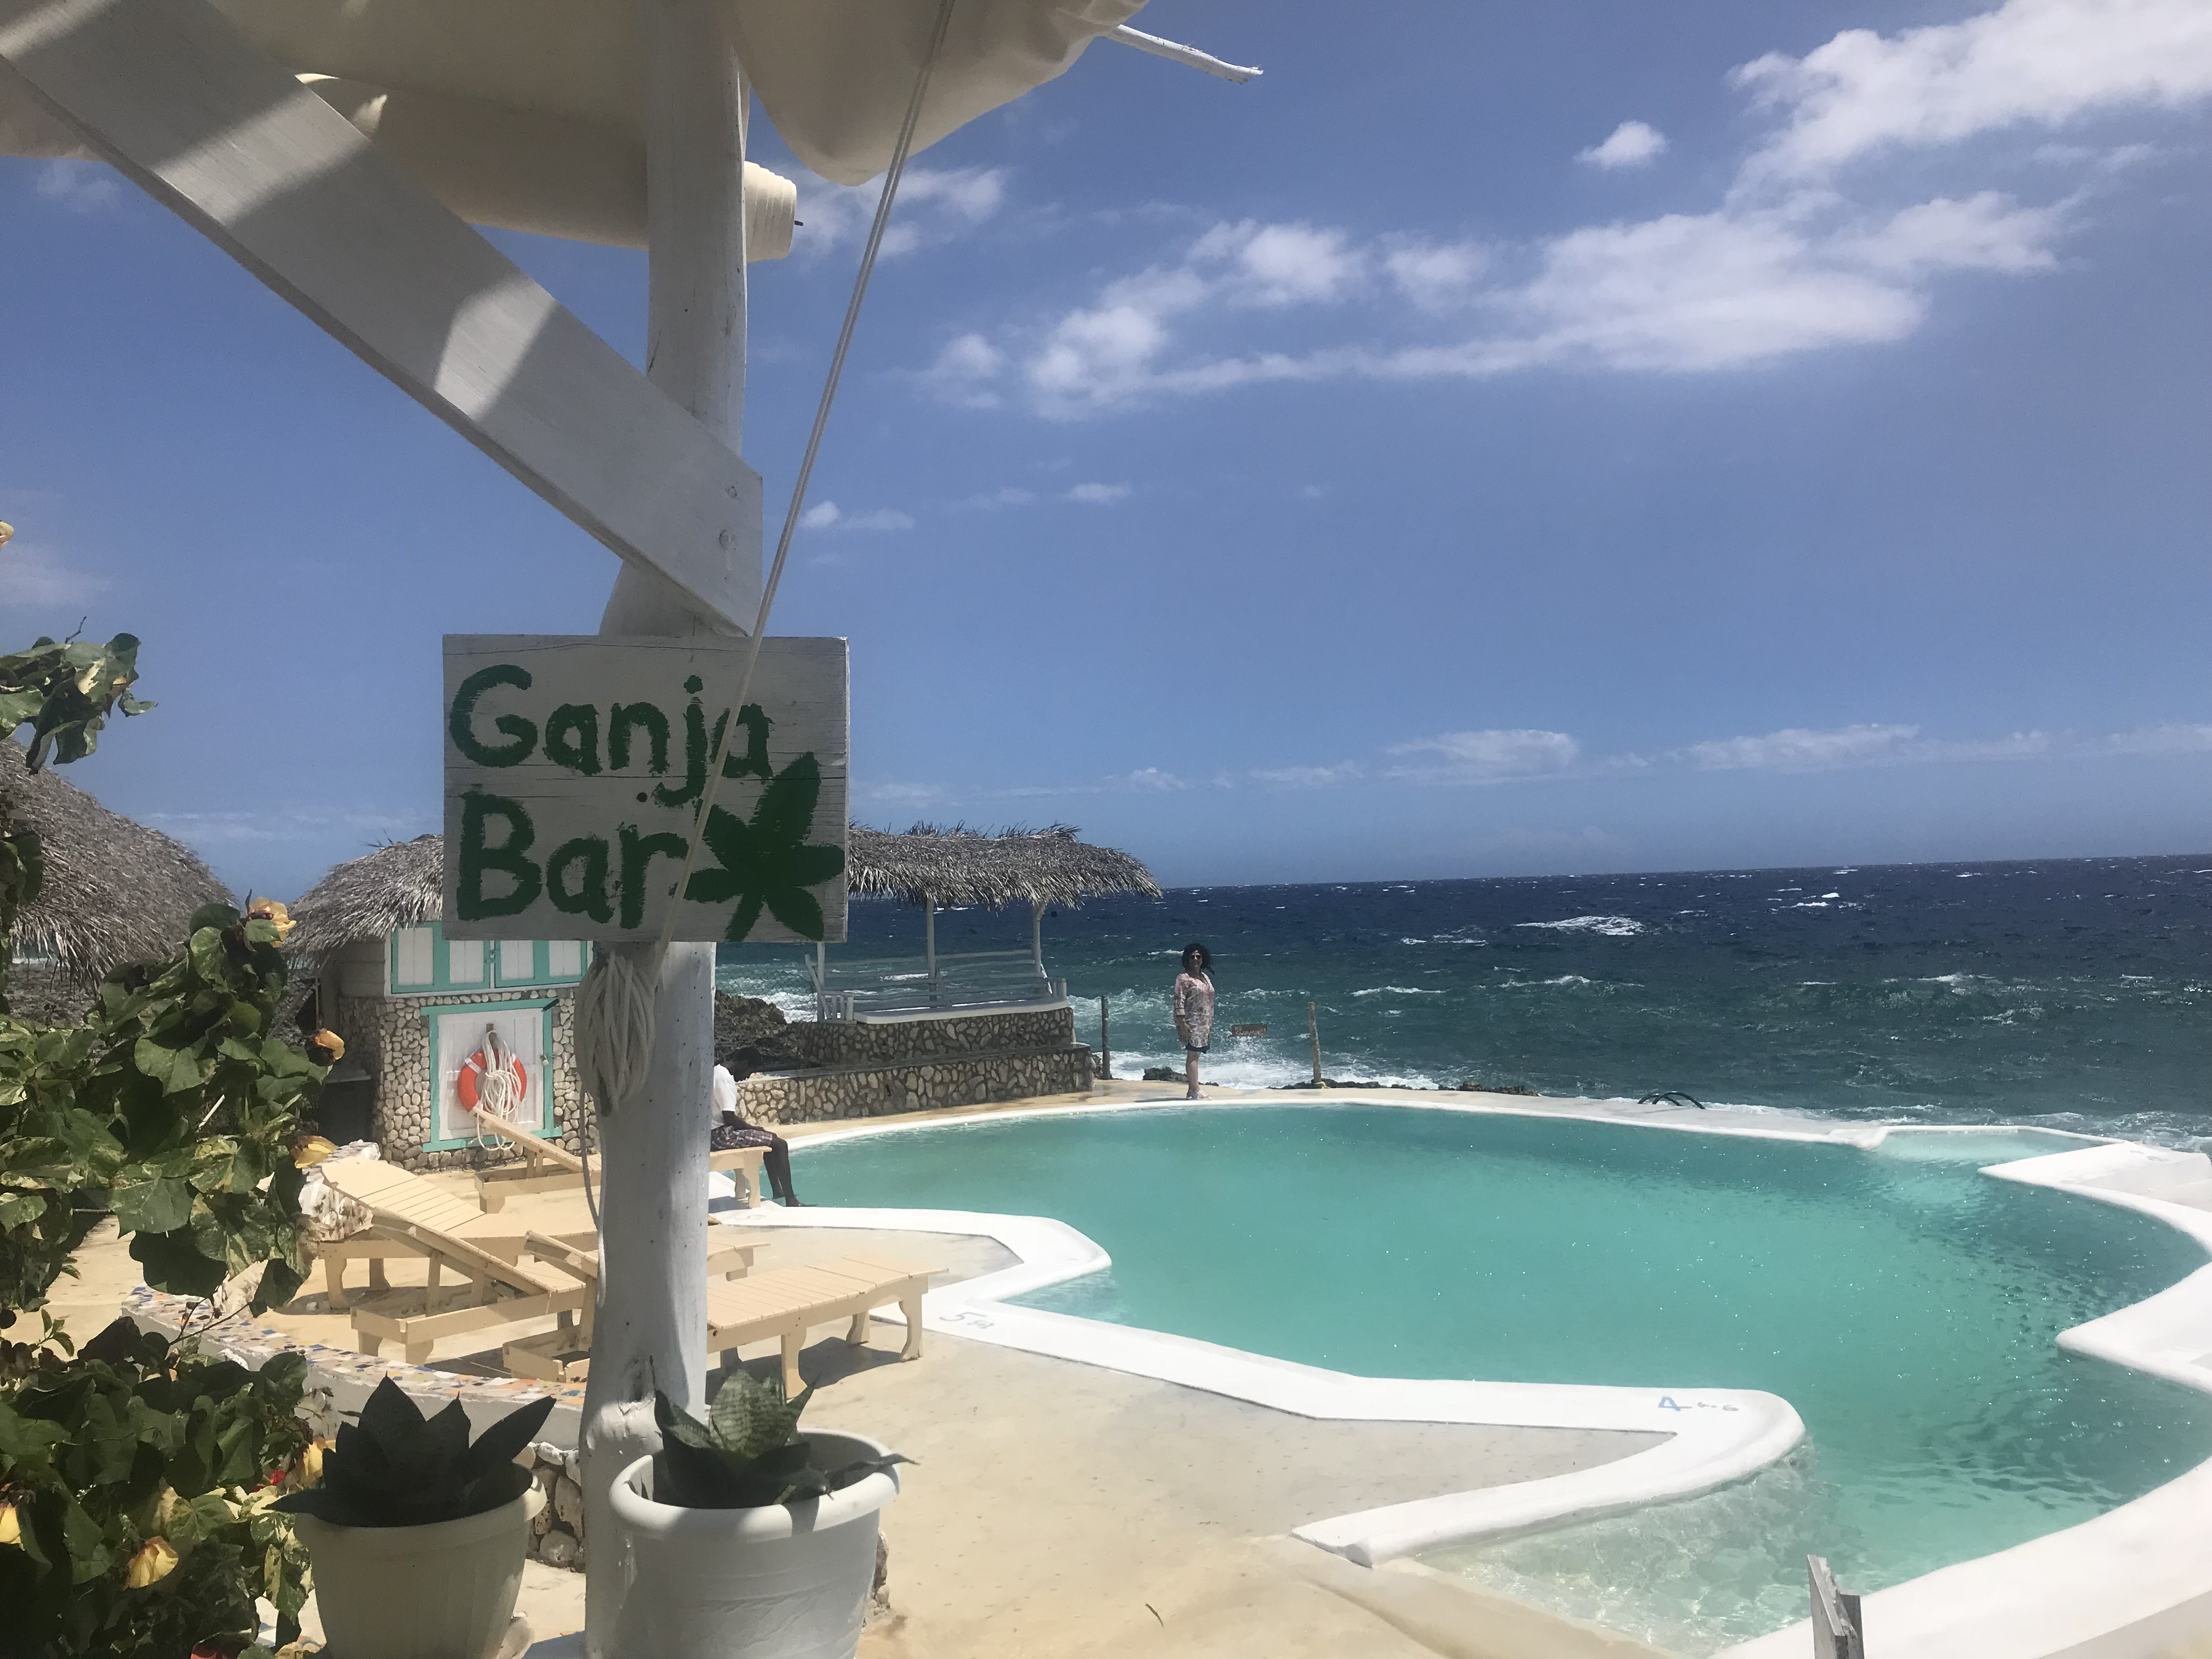 Jamaica Ya Man! Travels to The Land of Bob Marley